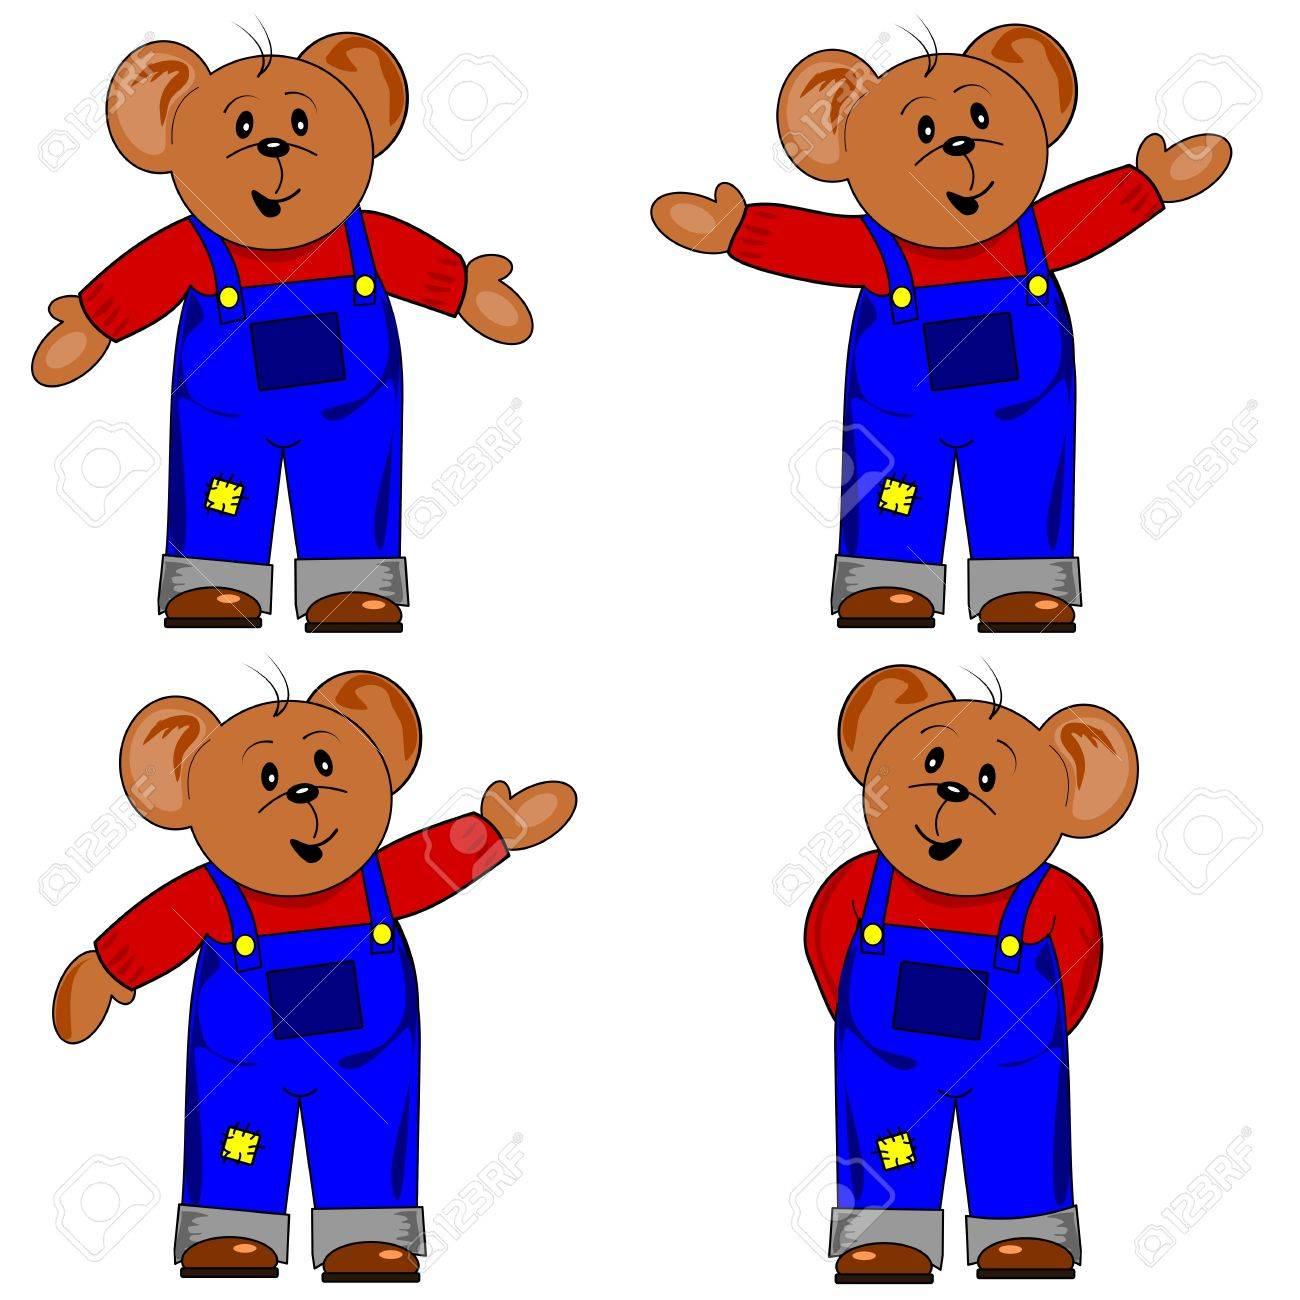 Cartoon teddy bear in various standing positions Stock Vector - 11744764